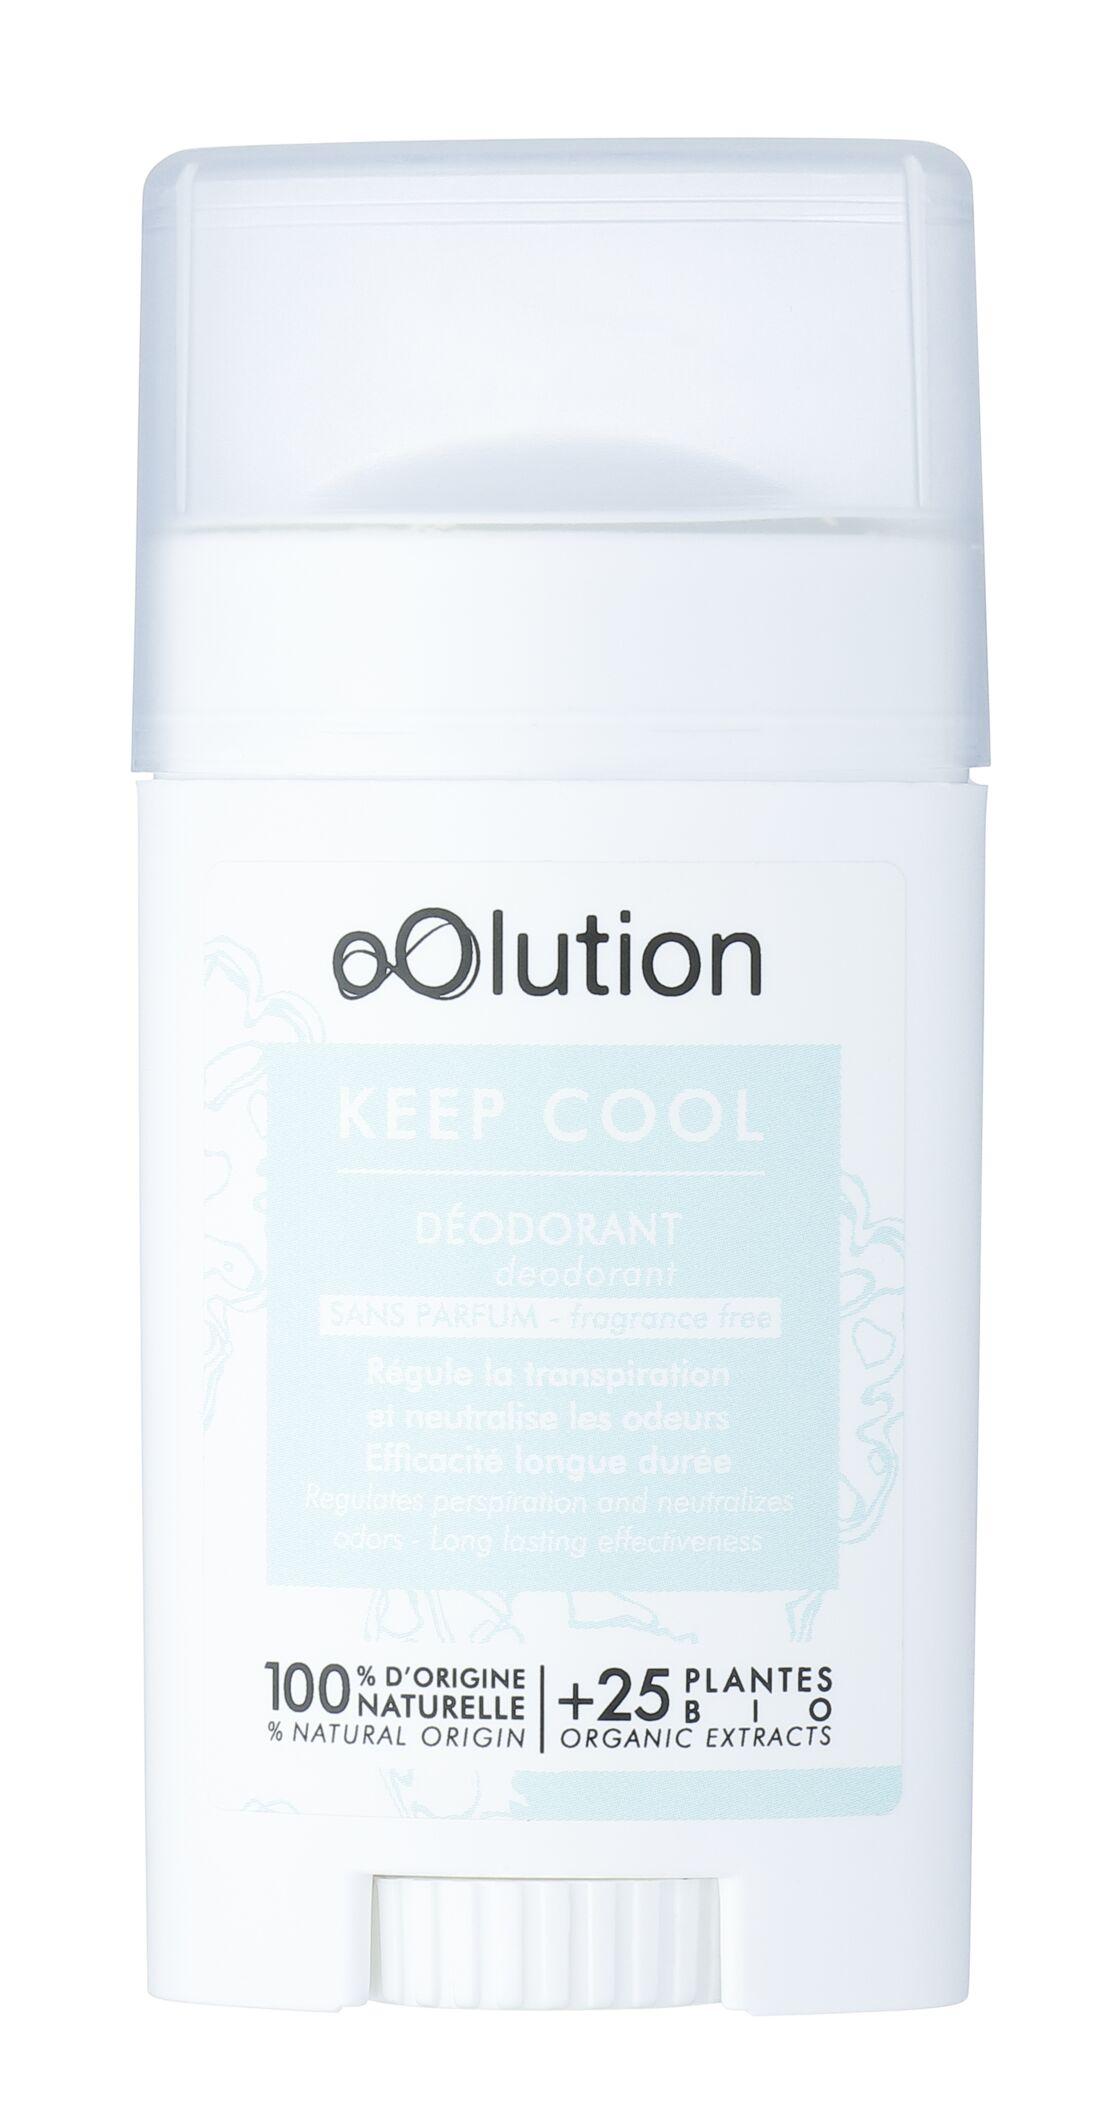 Déodorant Keep Cool, Oolution, 12 € sur oolution.com